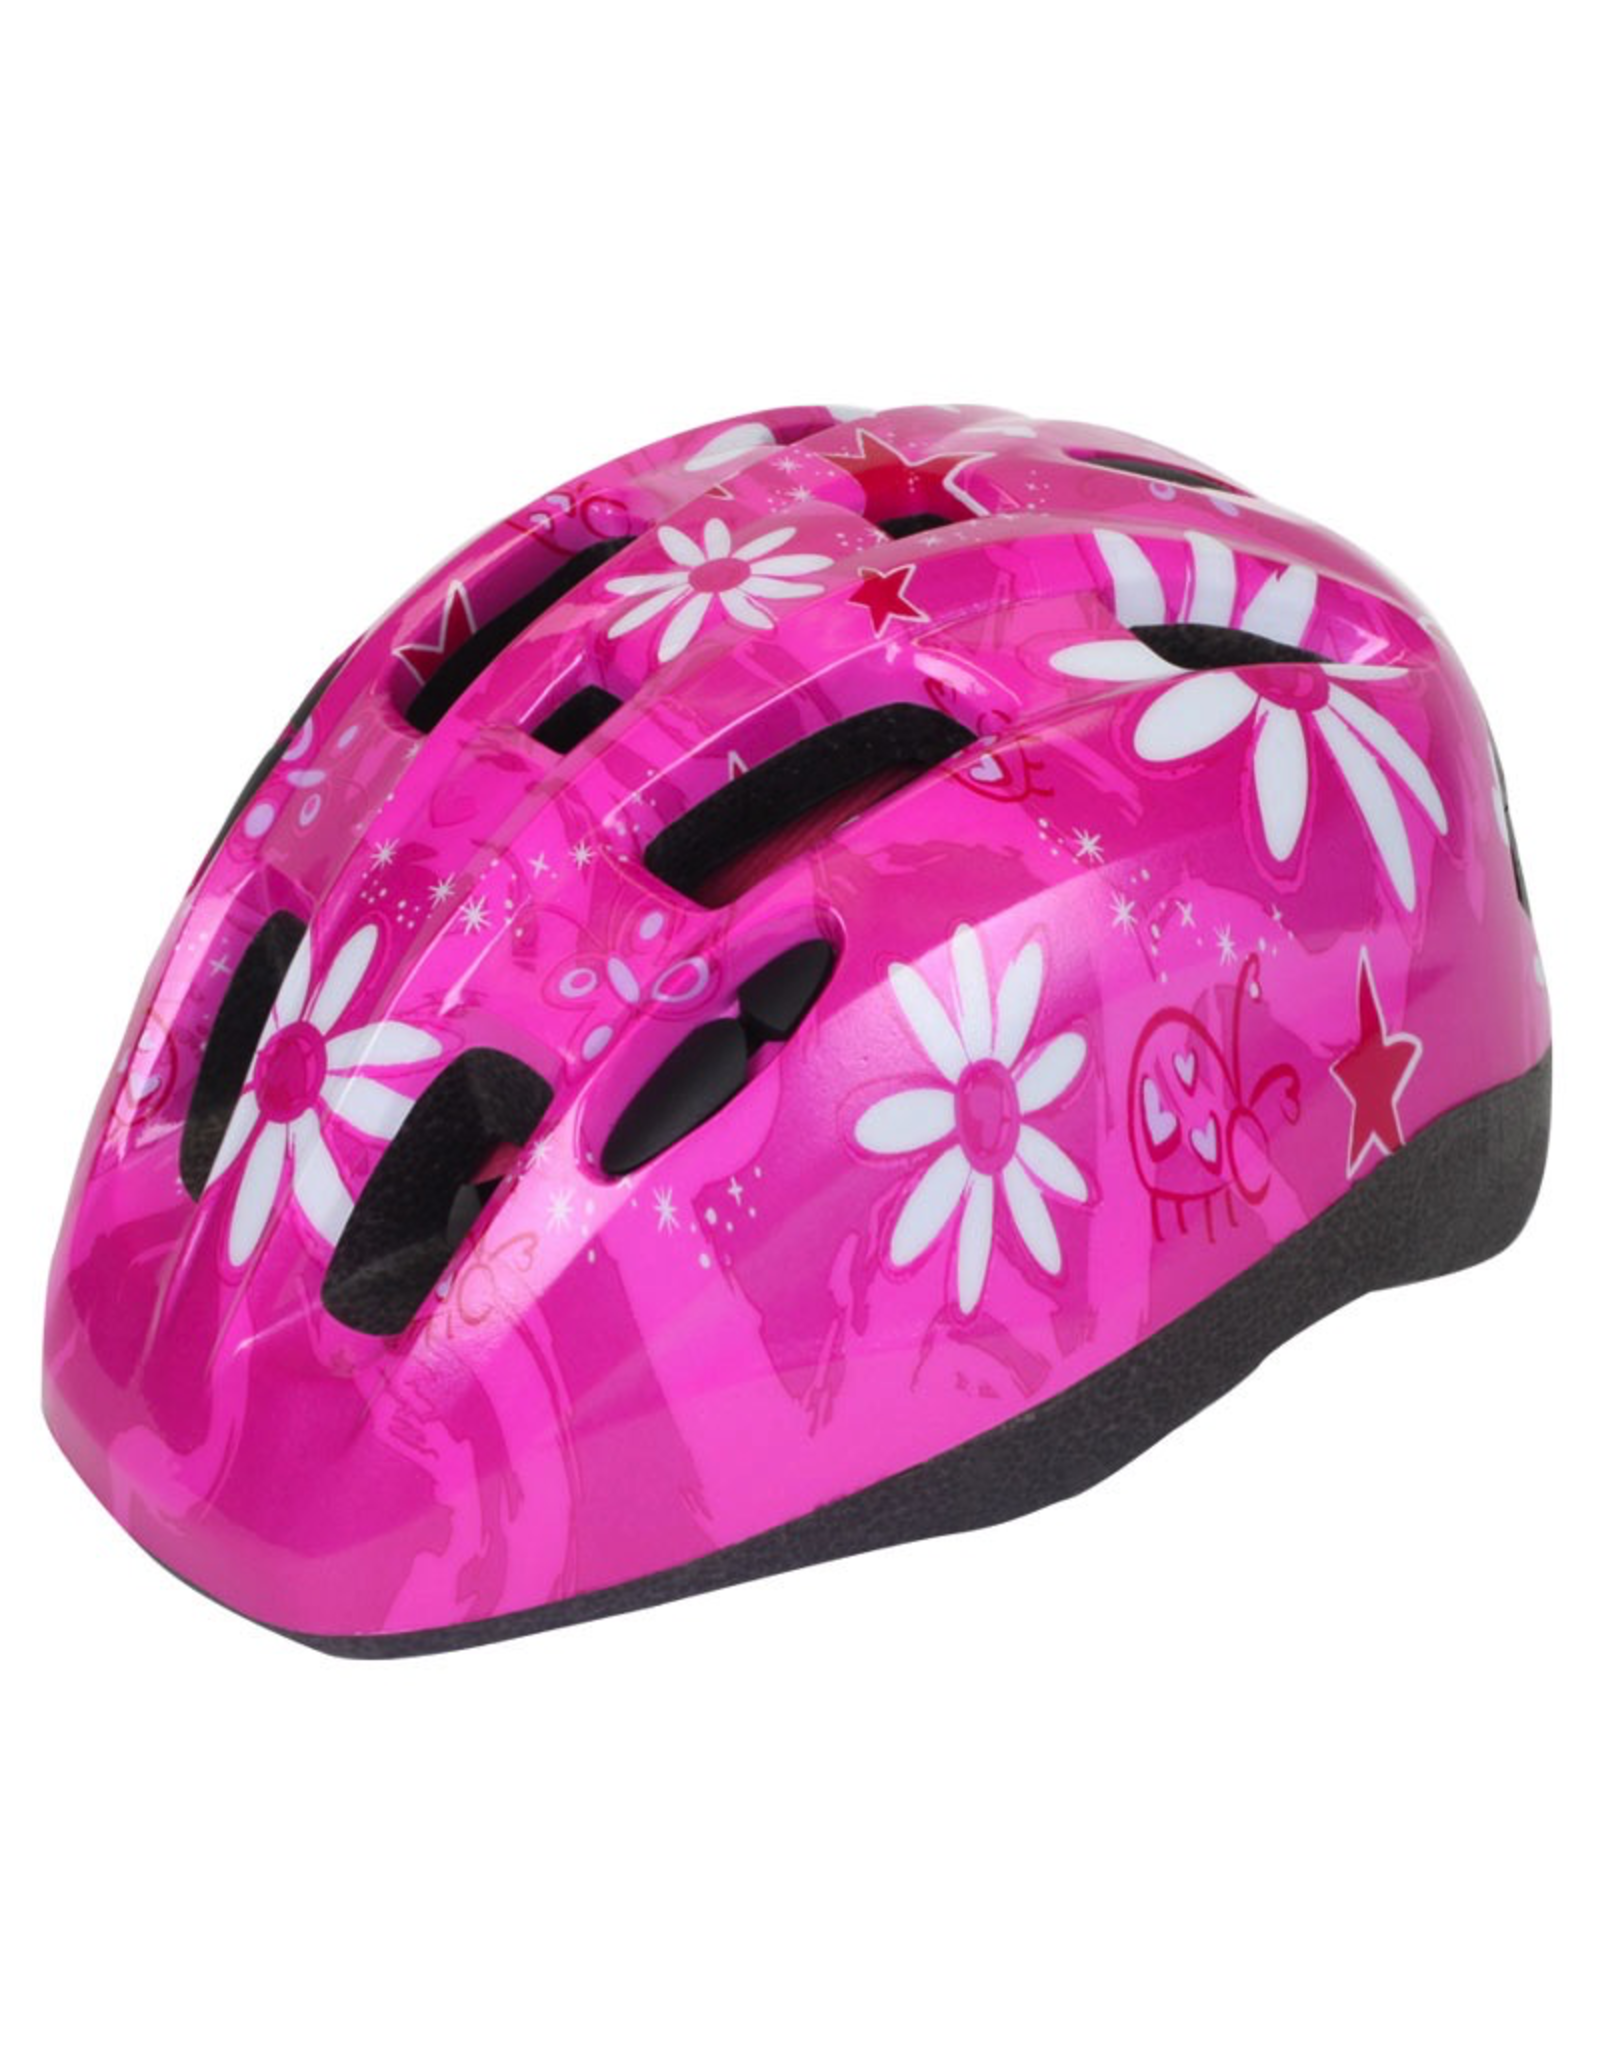 J & B Importers Aerius Xanthus V11iF Toddler Pink Flowers Helmet Small/Medium